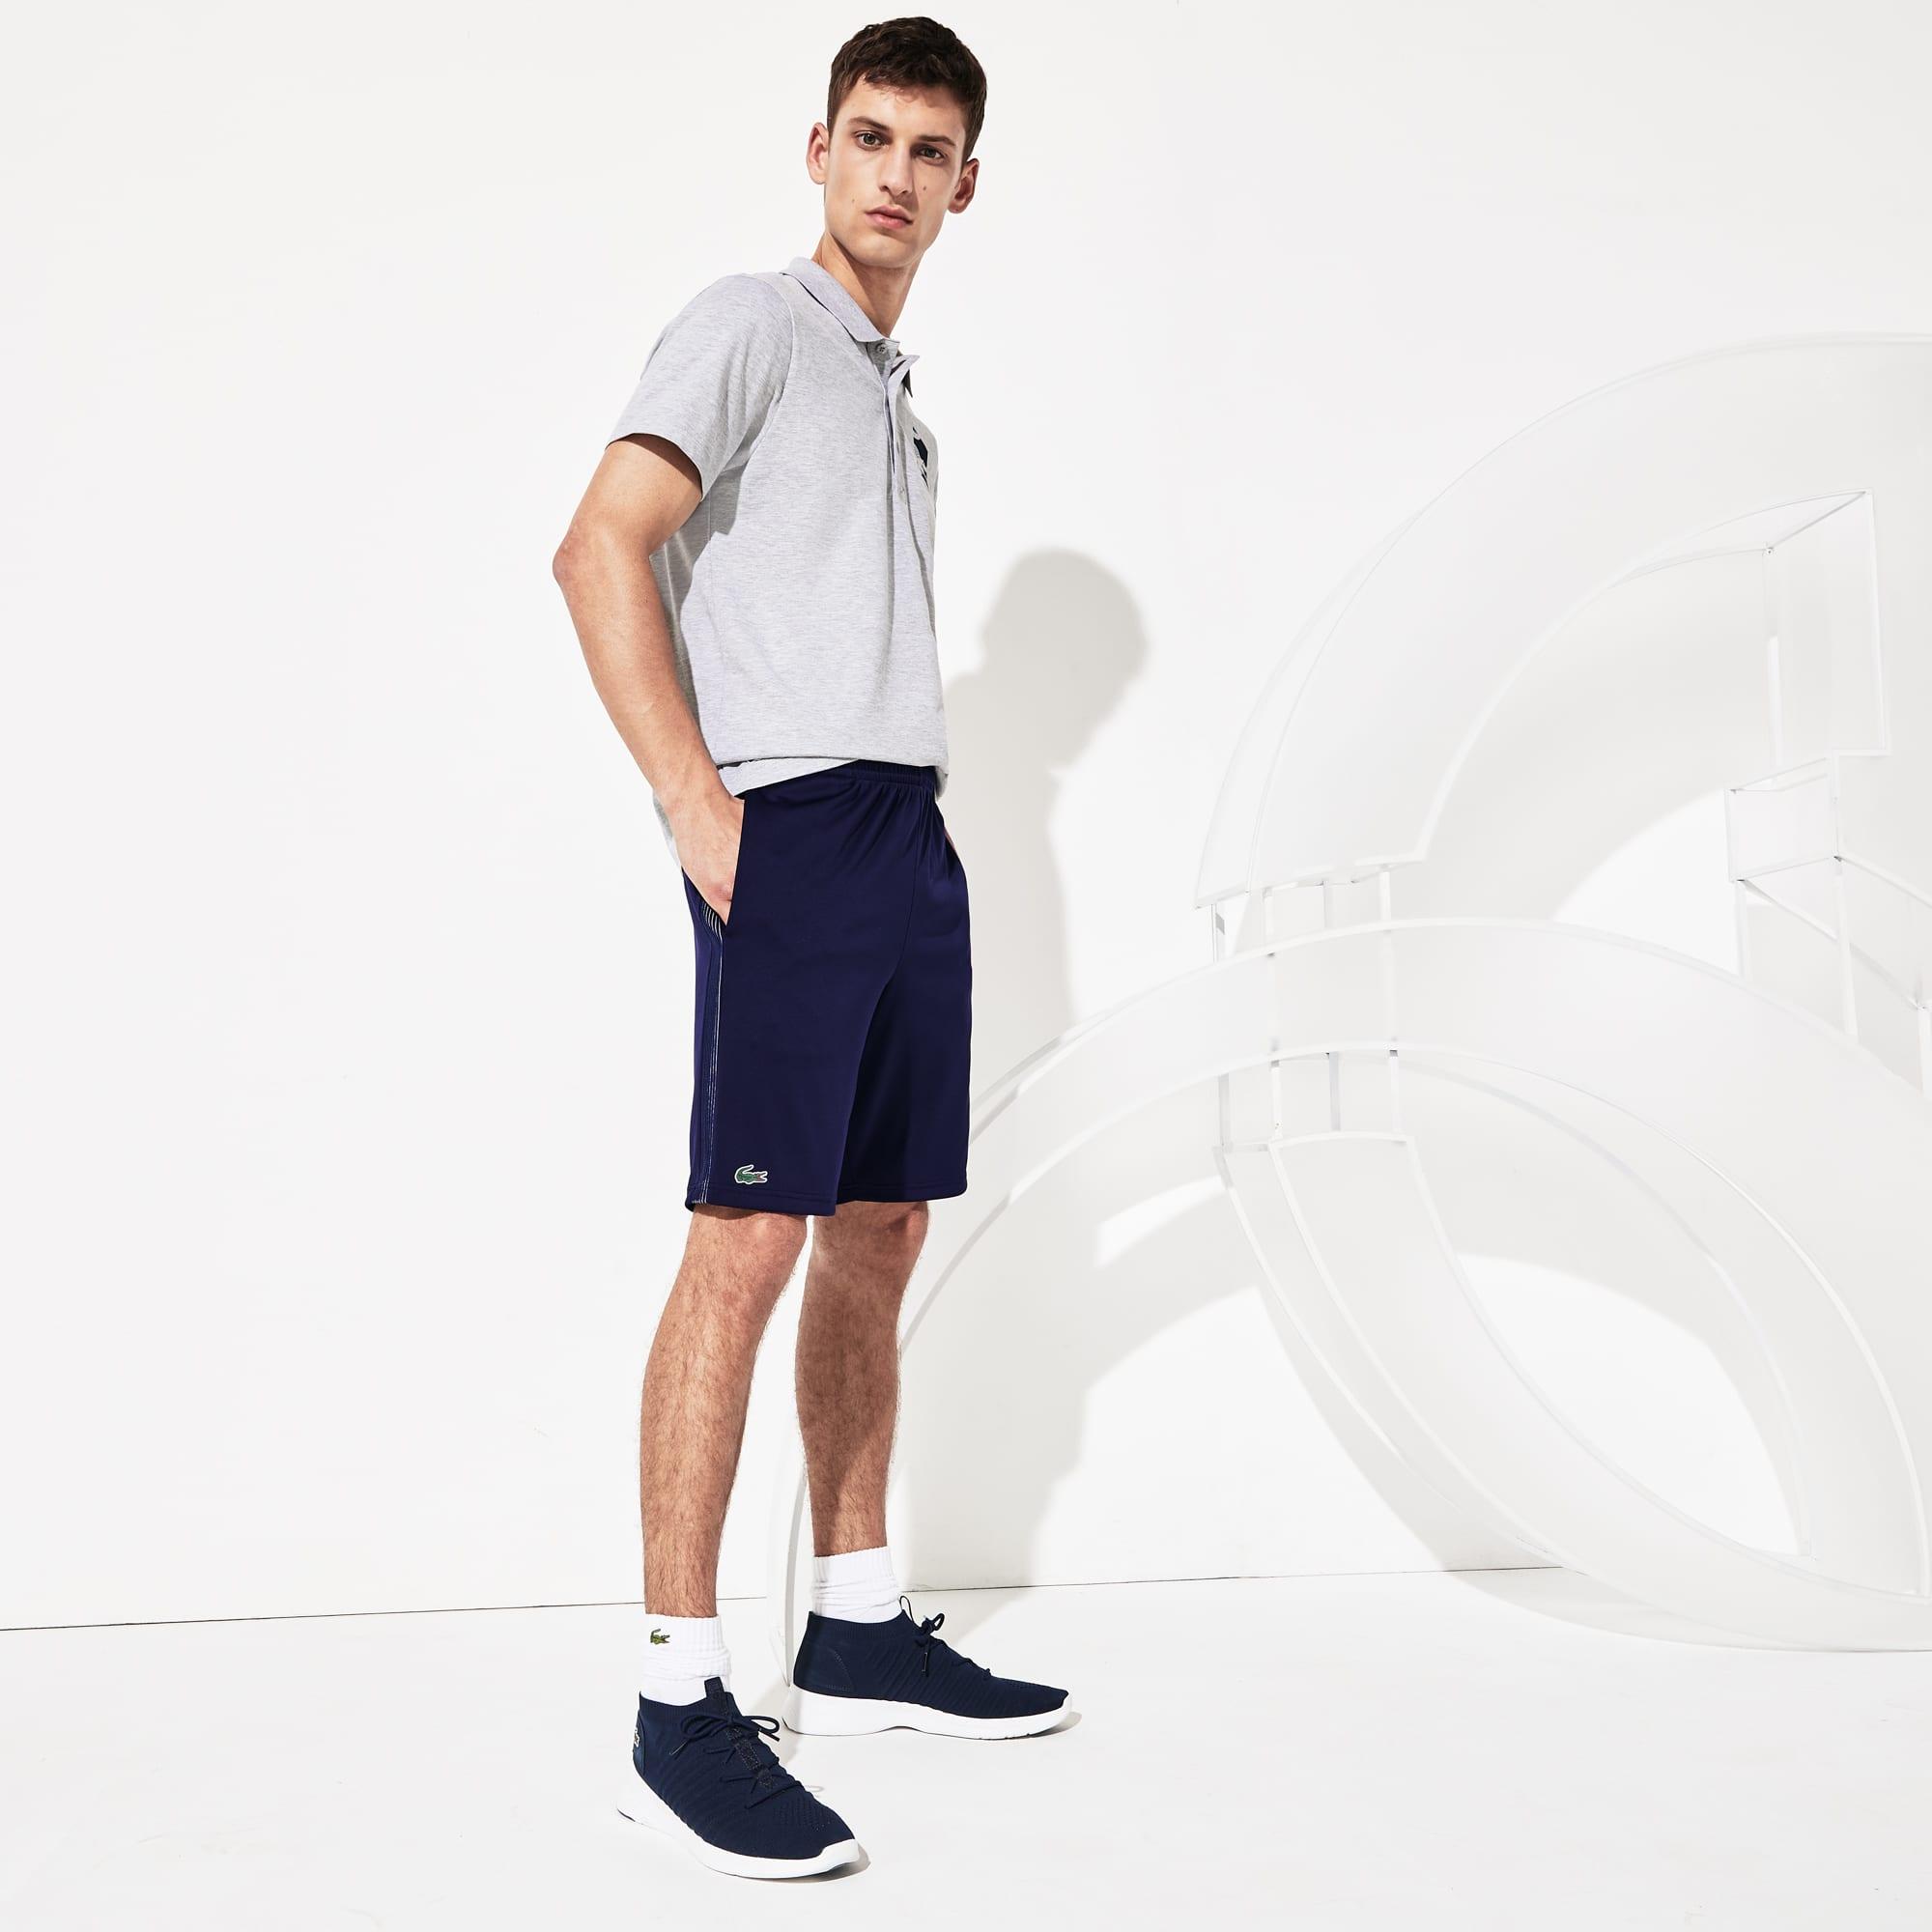 Herren LACOSTE SPORT NOVAK DJOKOVIC Shorts aus Piqué